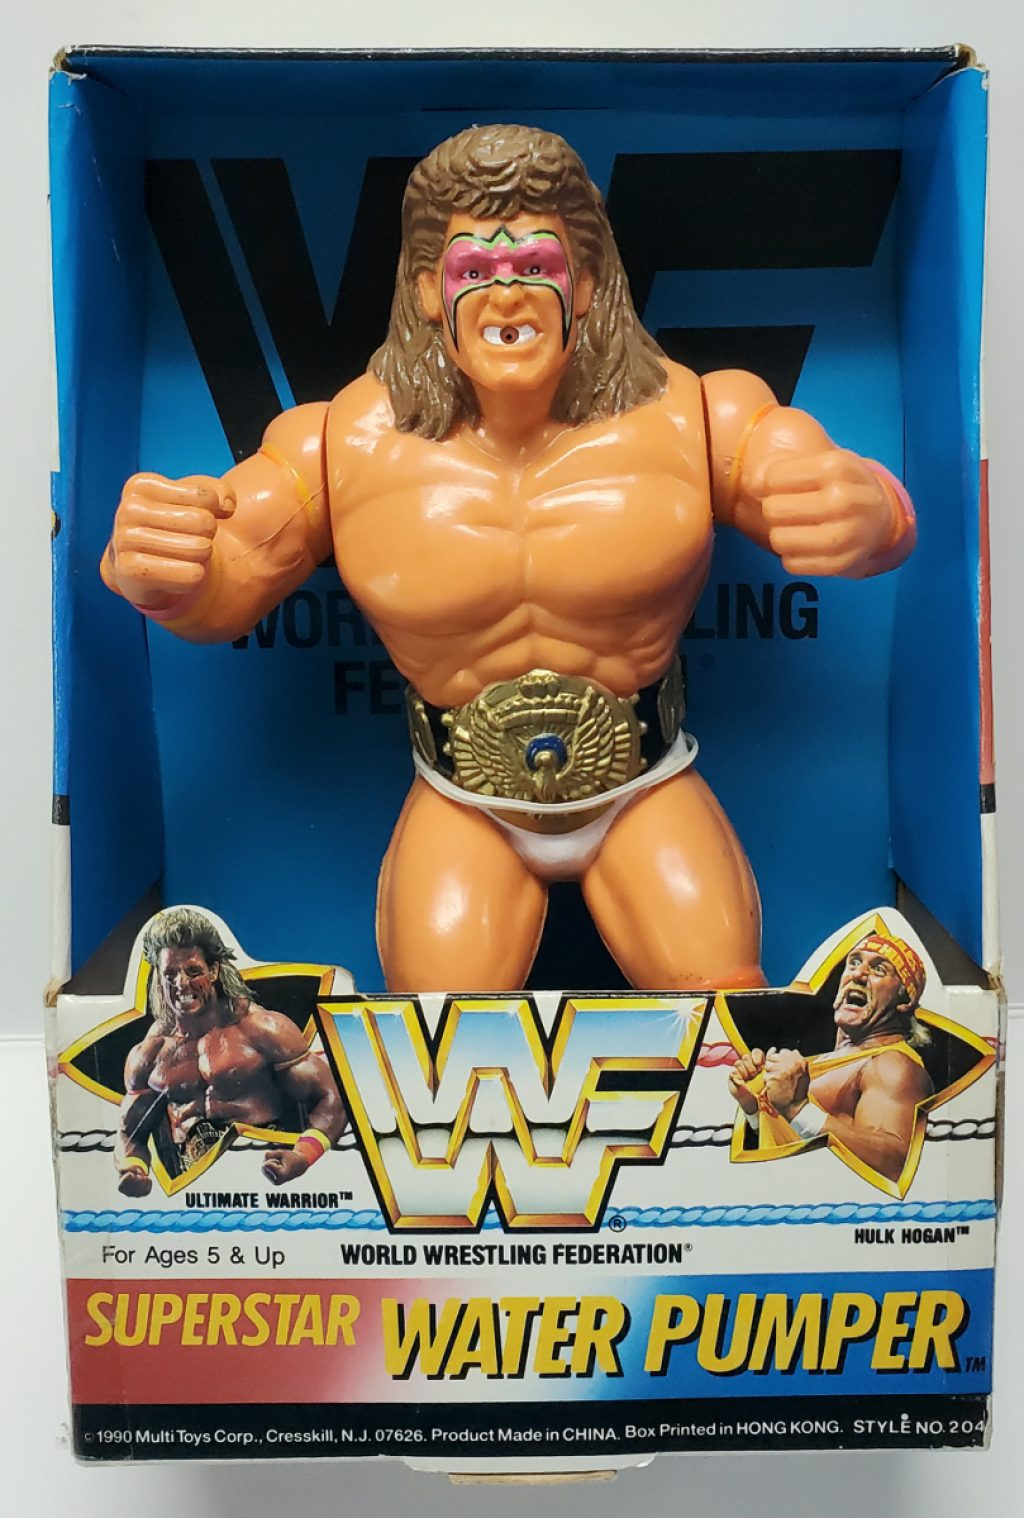 WWF Superstar Ultimate Warrior Water Pumper in the Box 1